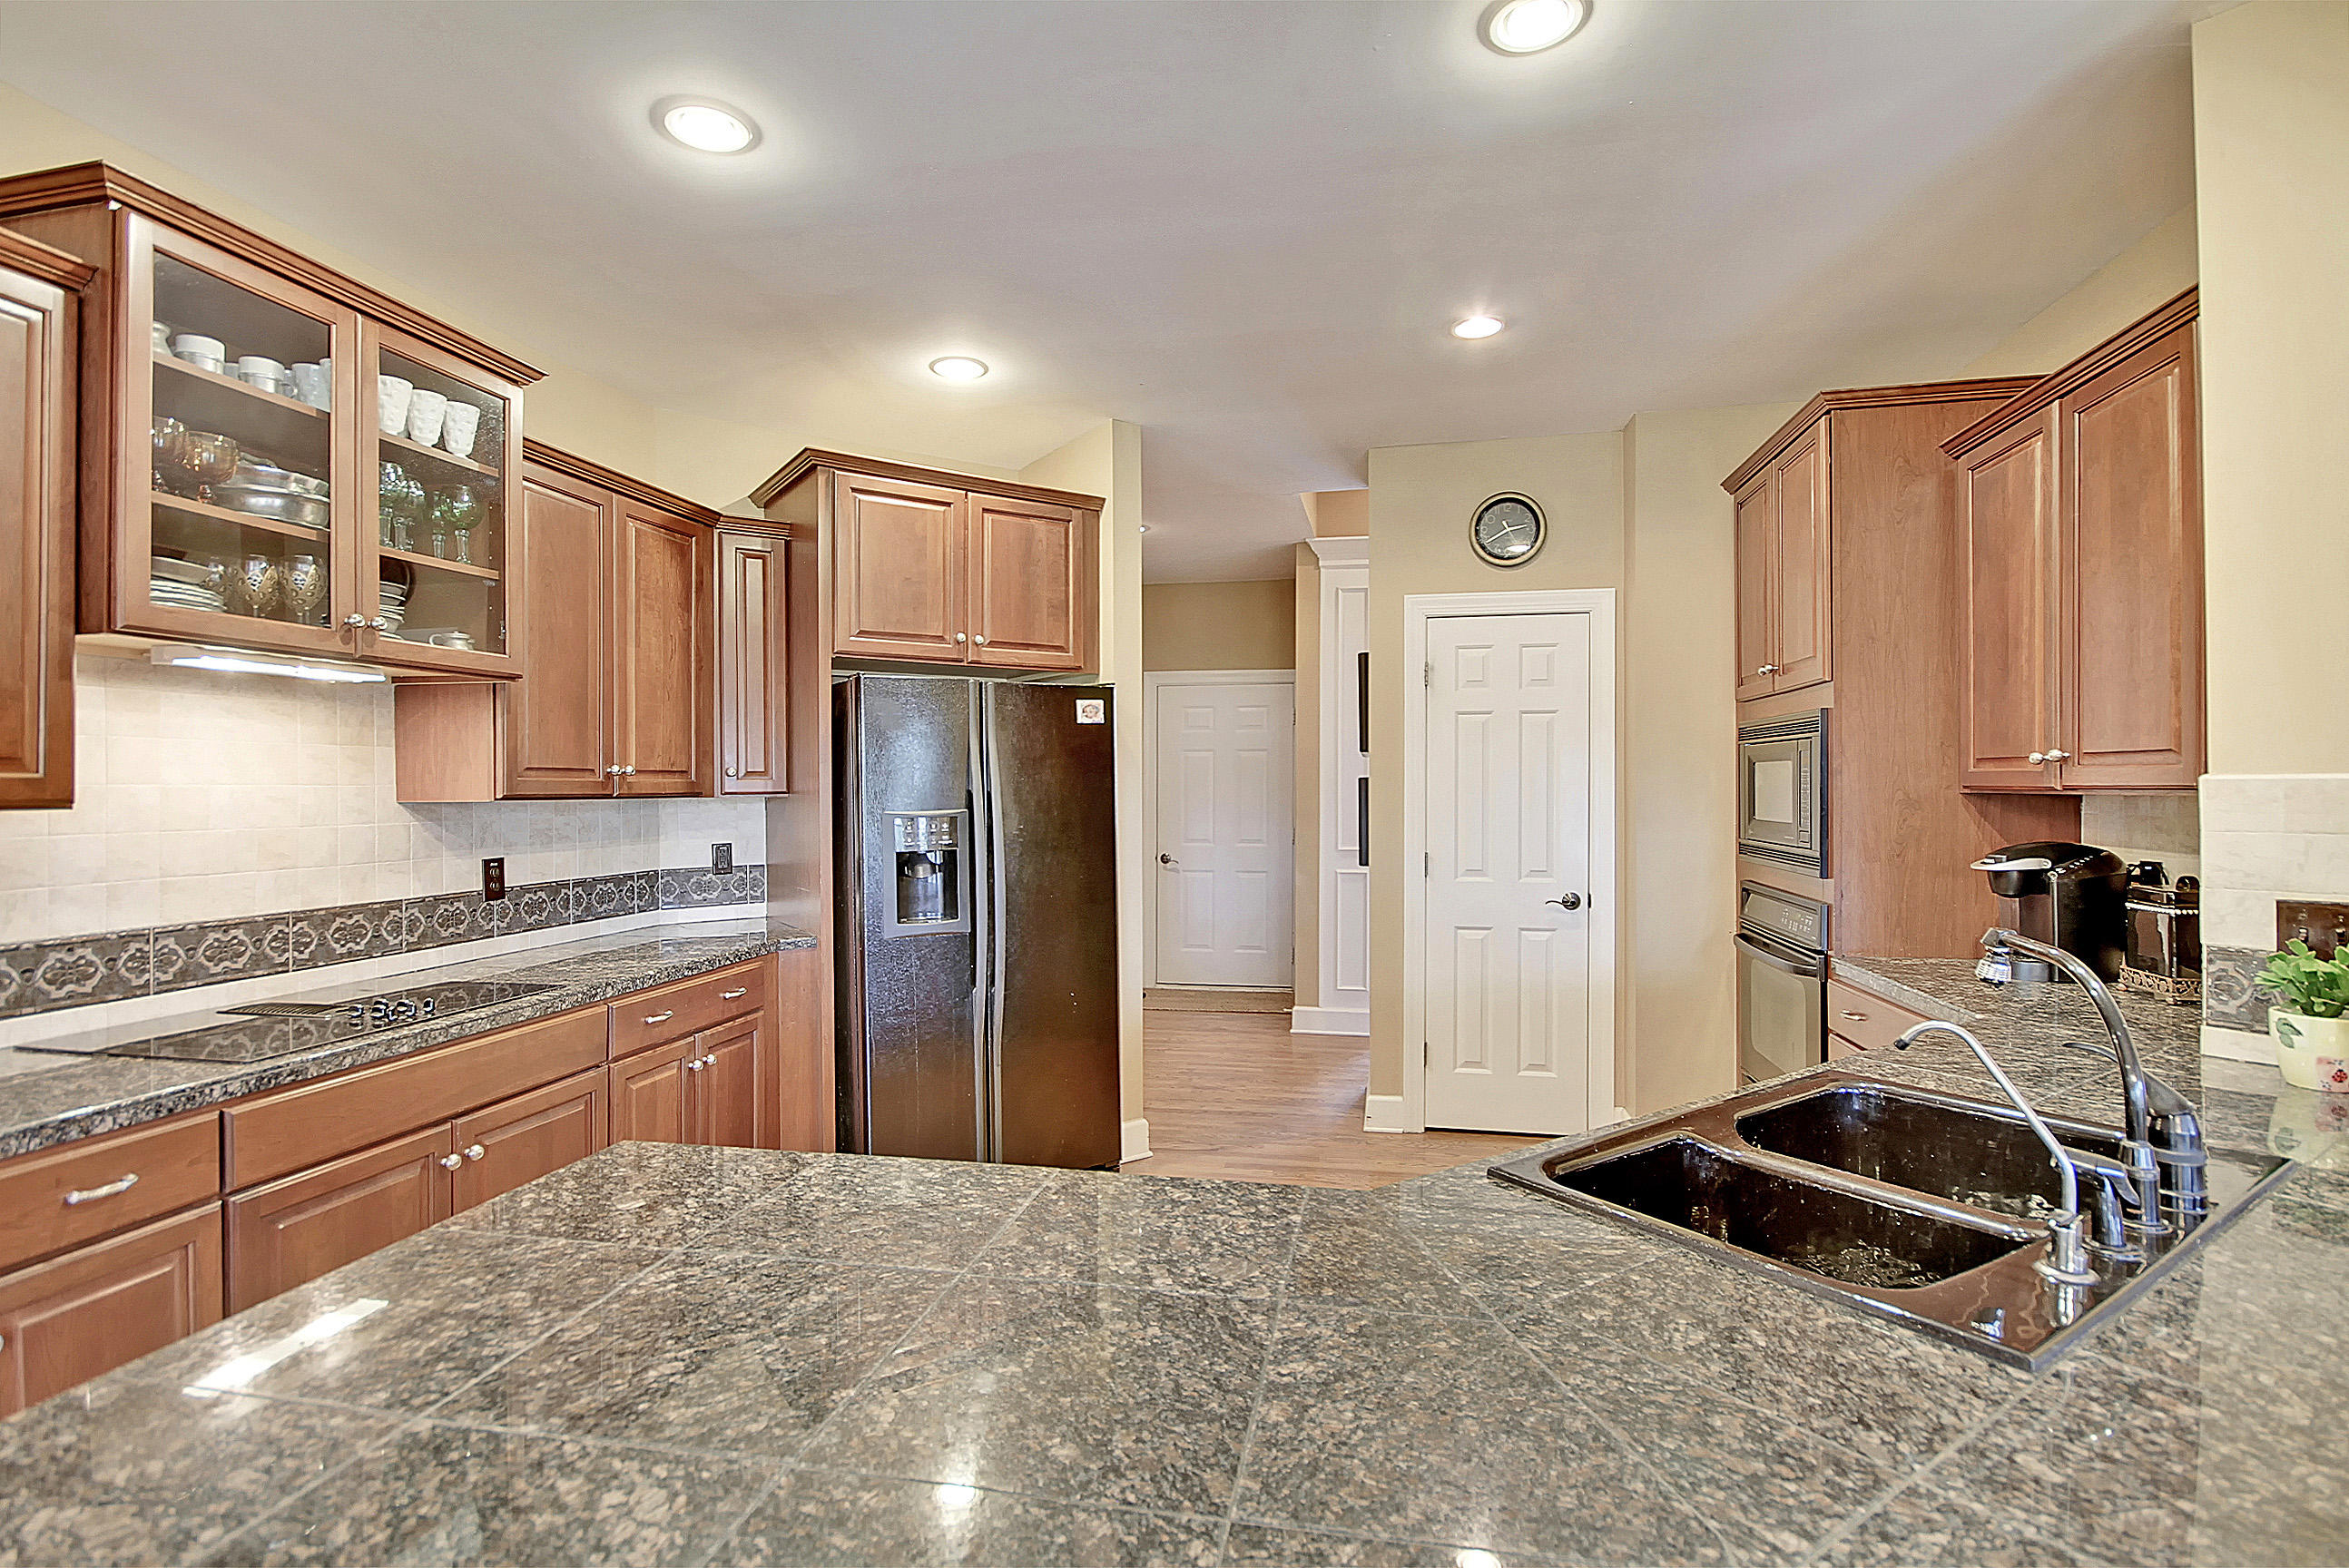 Dunes West Homes For Sale - 4002 Colonel Vanderhorst, Mount Pleasant, SC - 13